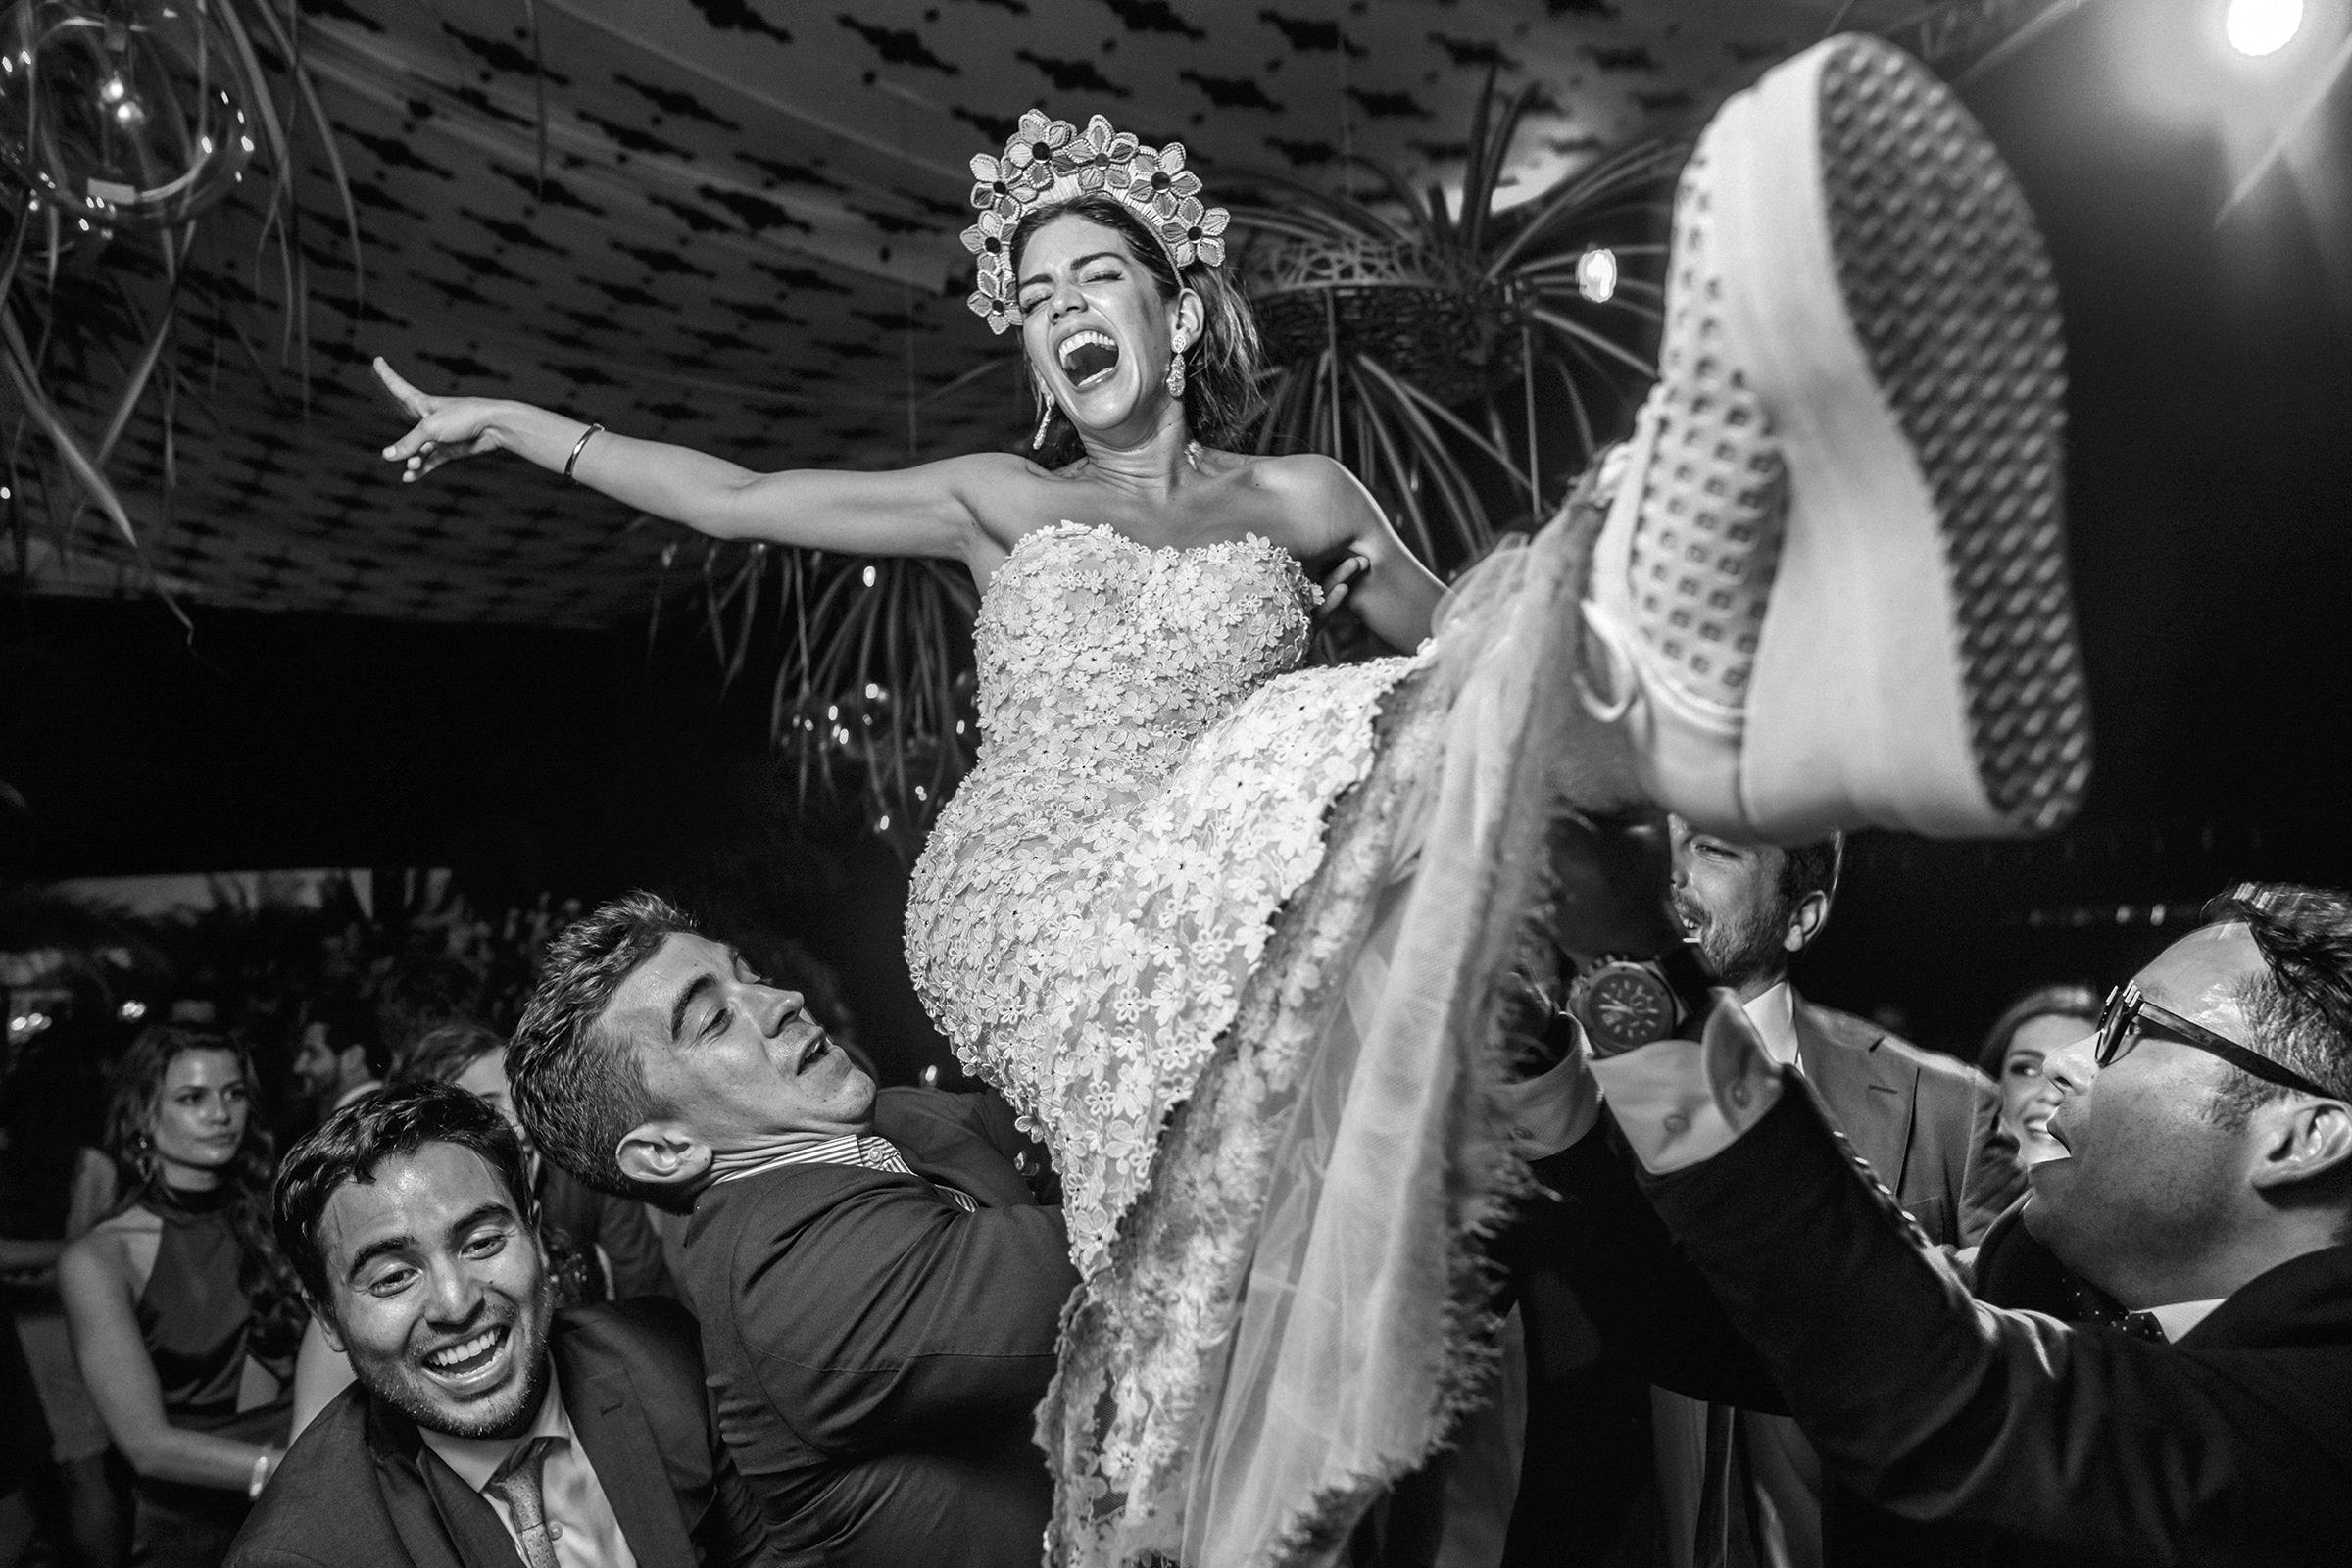 estatic-bride-on-guests-shoulders-elmarcorojo-spain